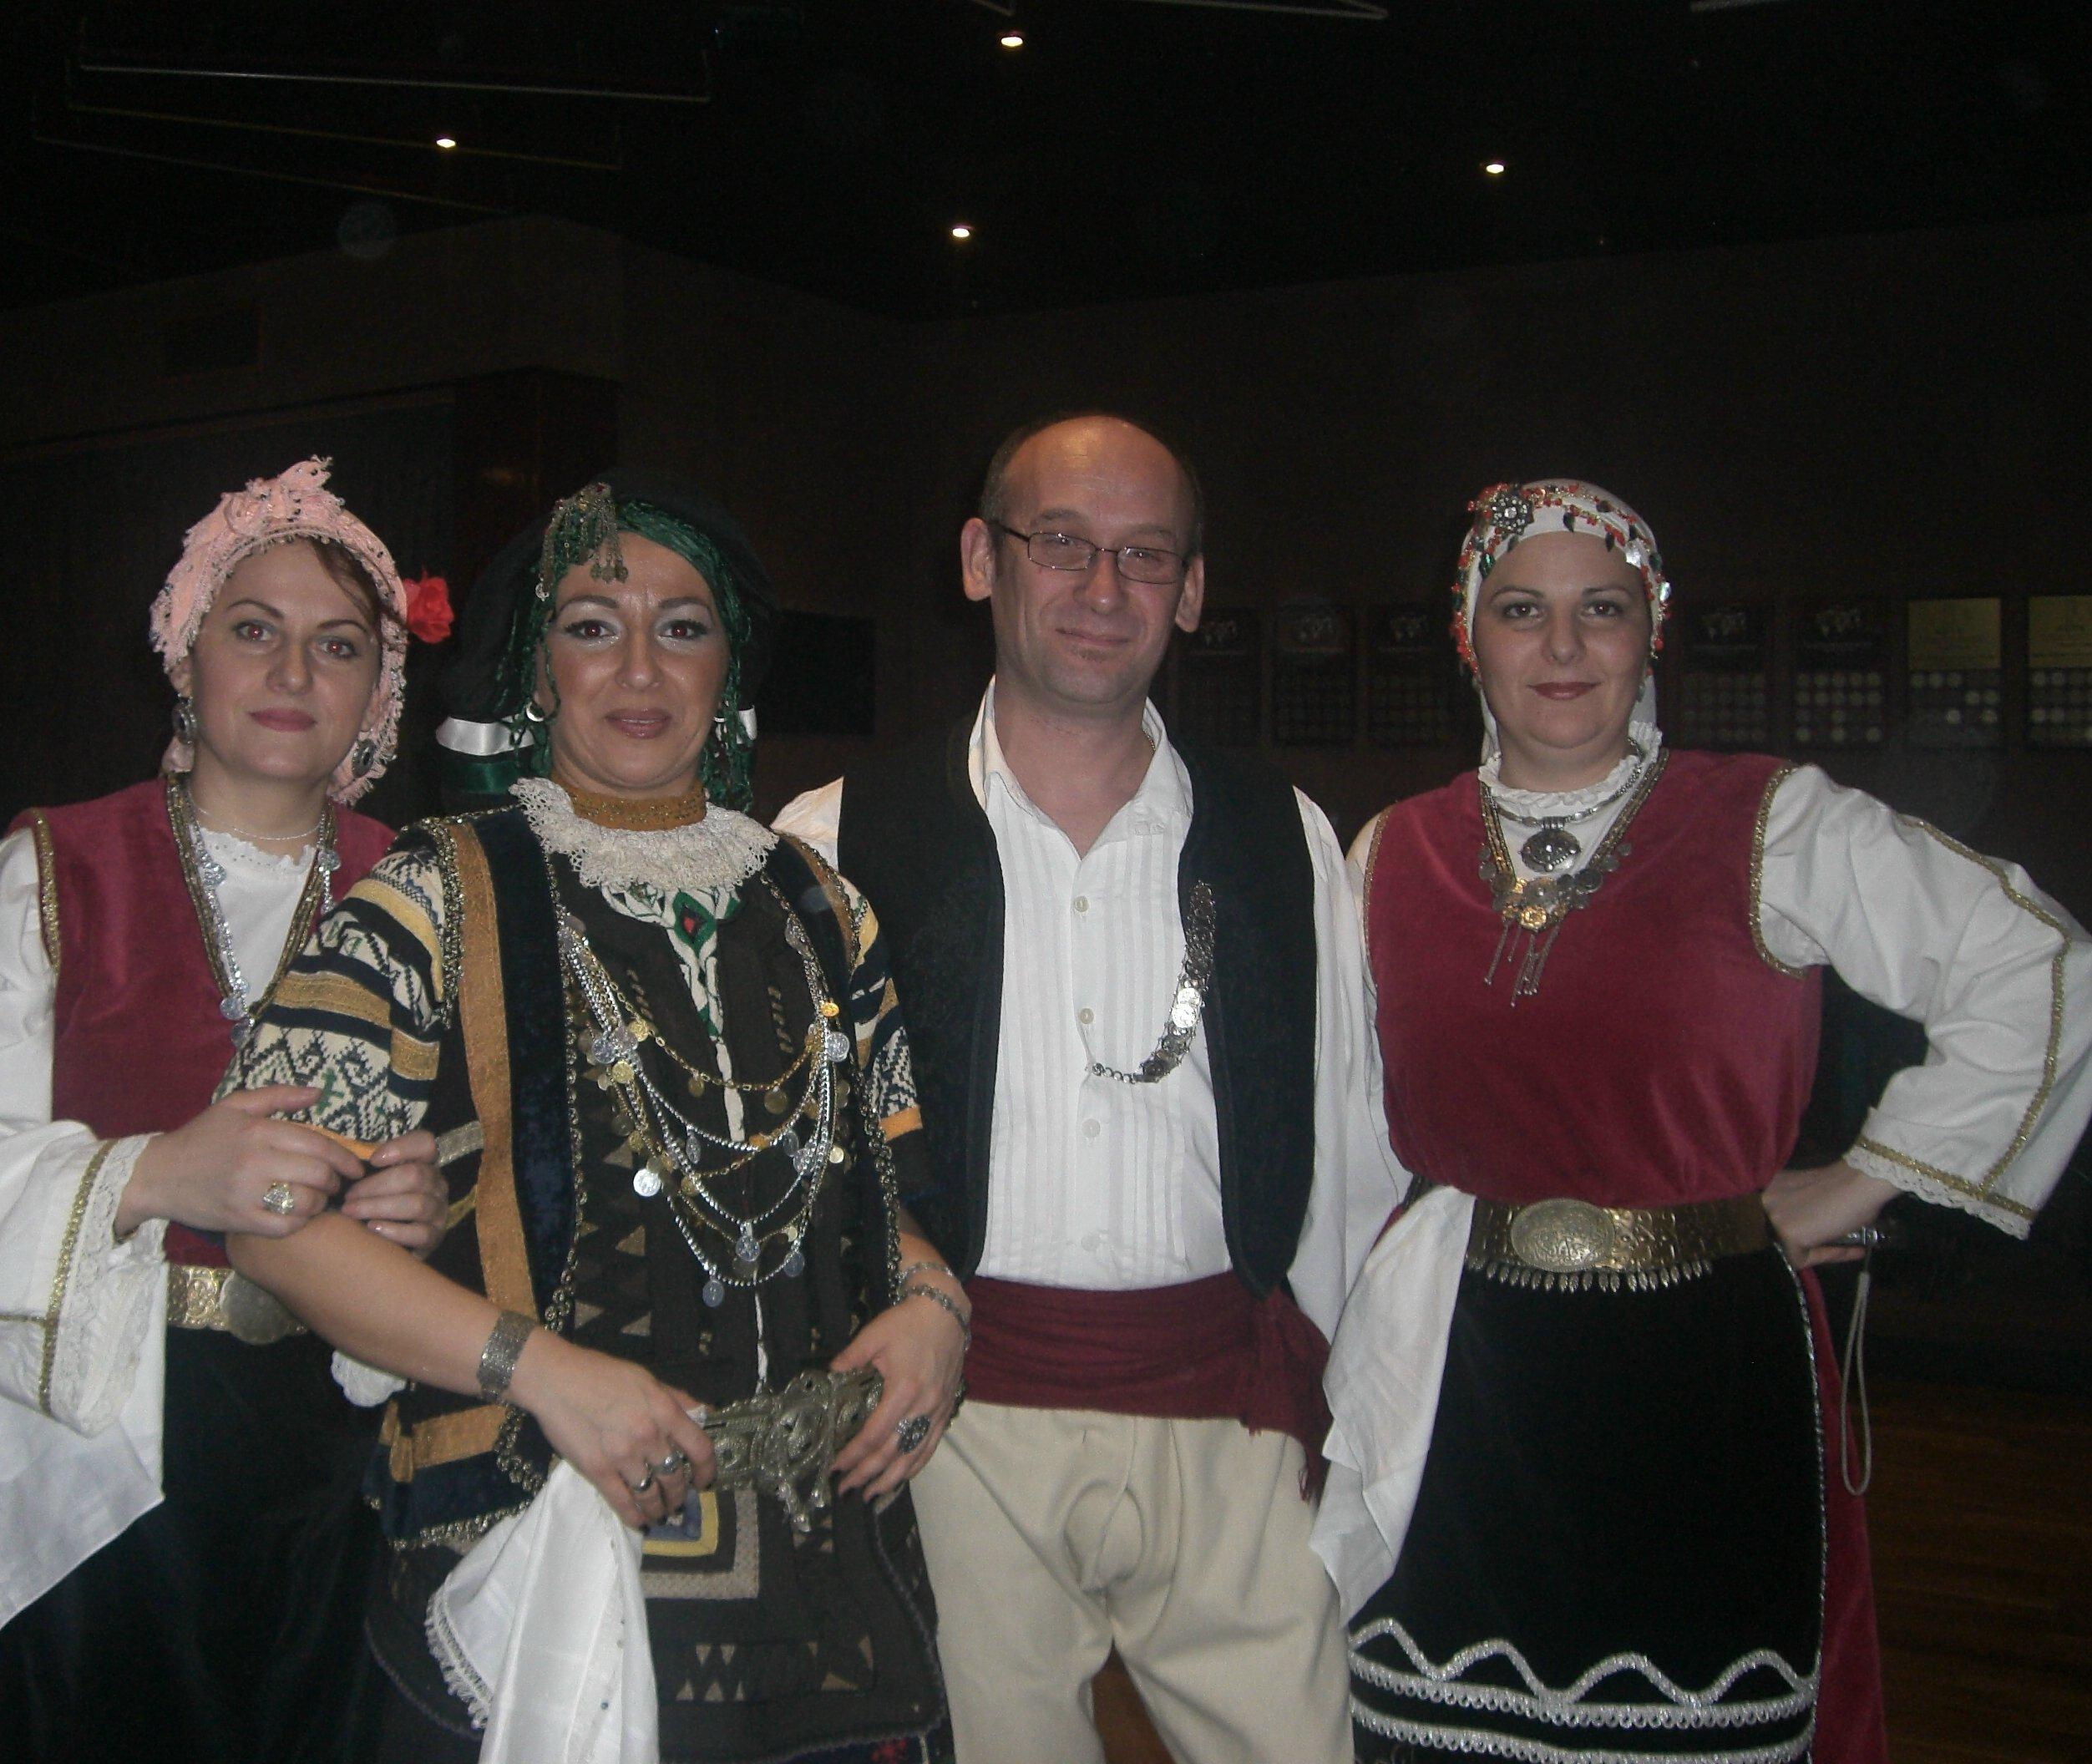 Ratingen (Kurz vor Auftritt) - 27. 02. 2011